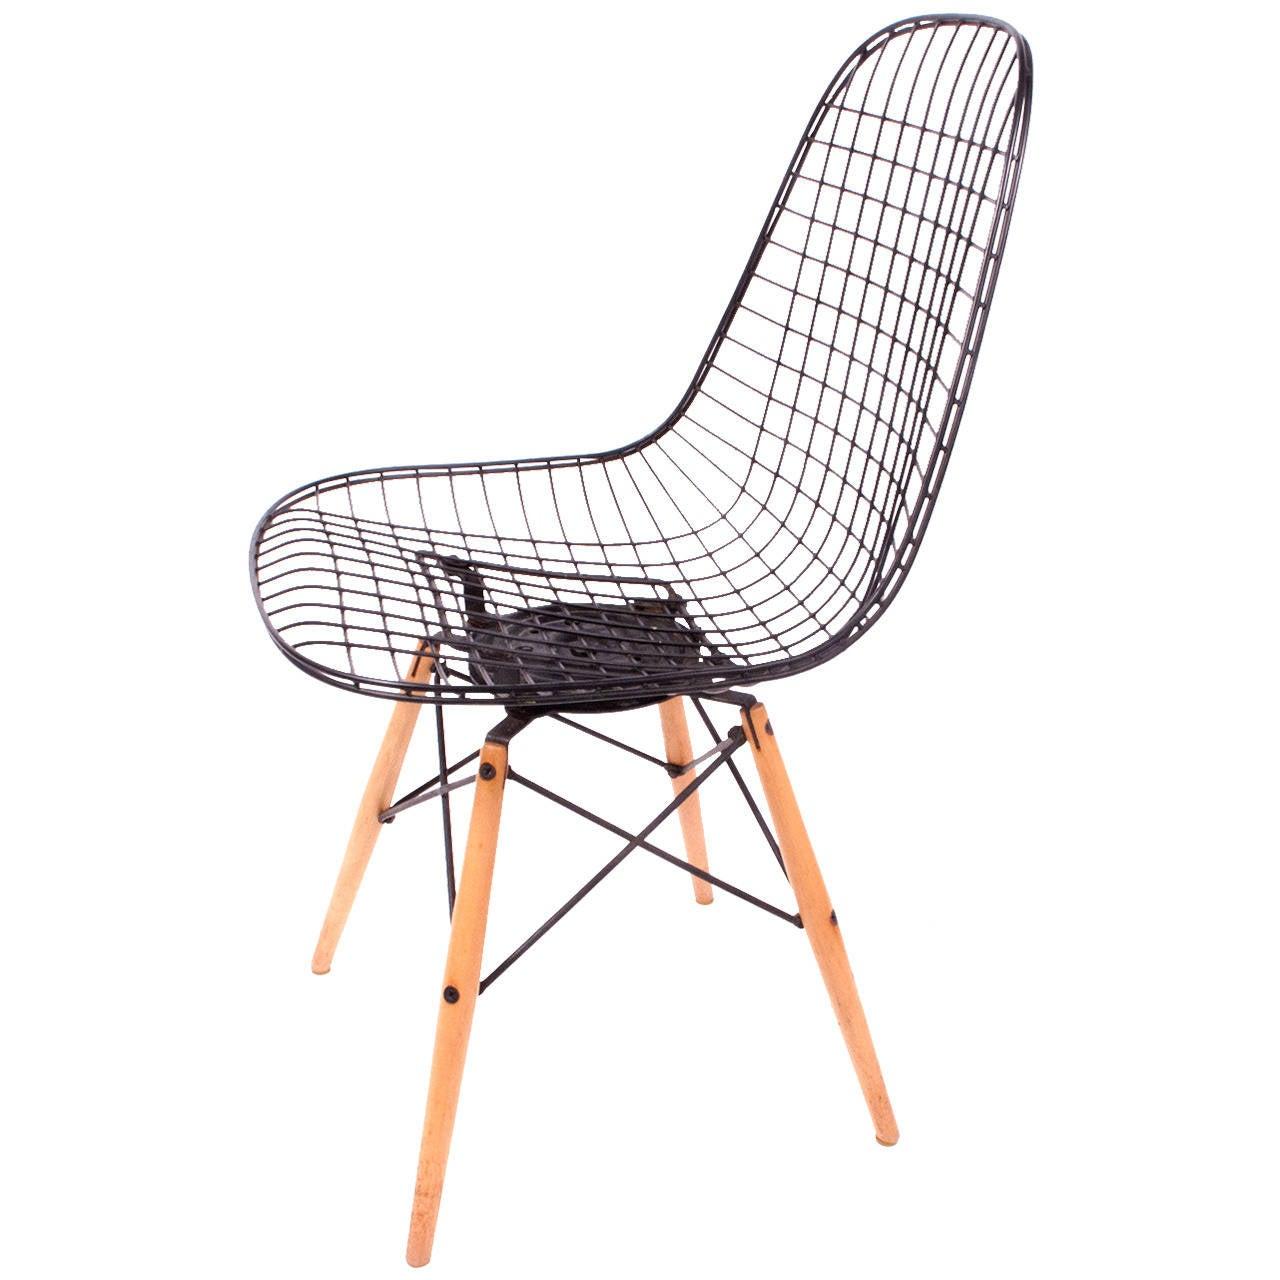 Original Pkw Charles Eames Dowel Leg Swivel Chair At 1stdibs